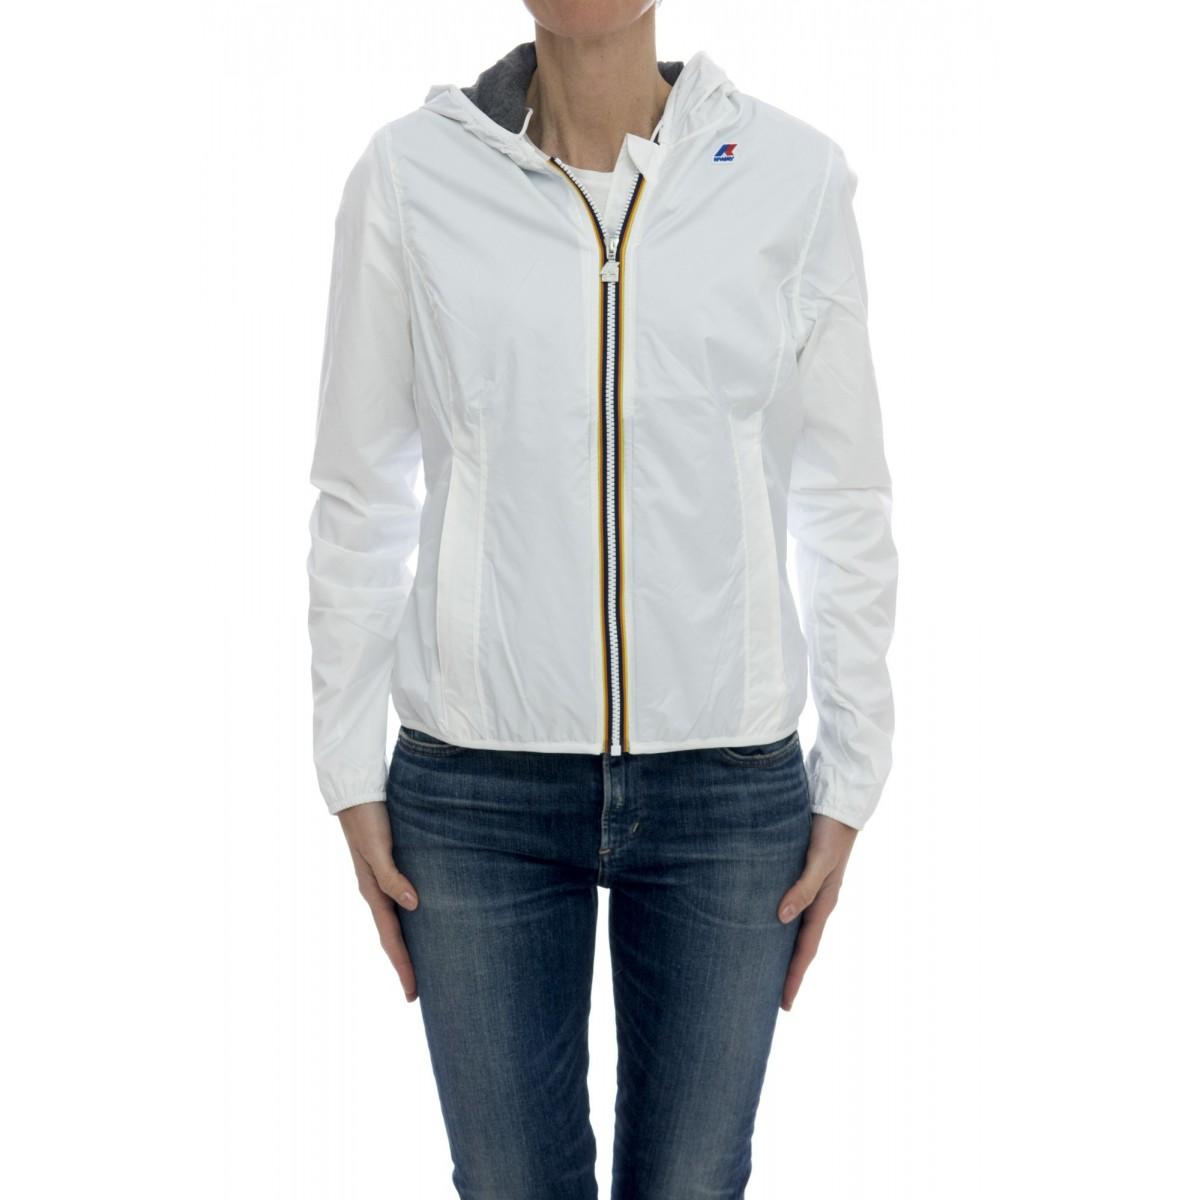 Giubbino - Lily jersey k007a00 interno jersey